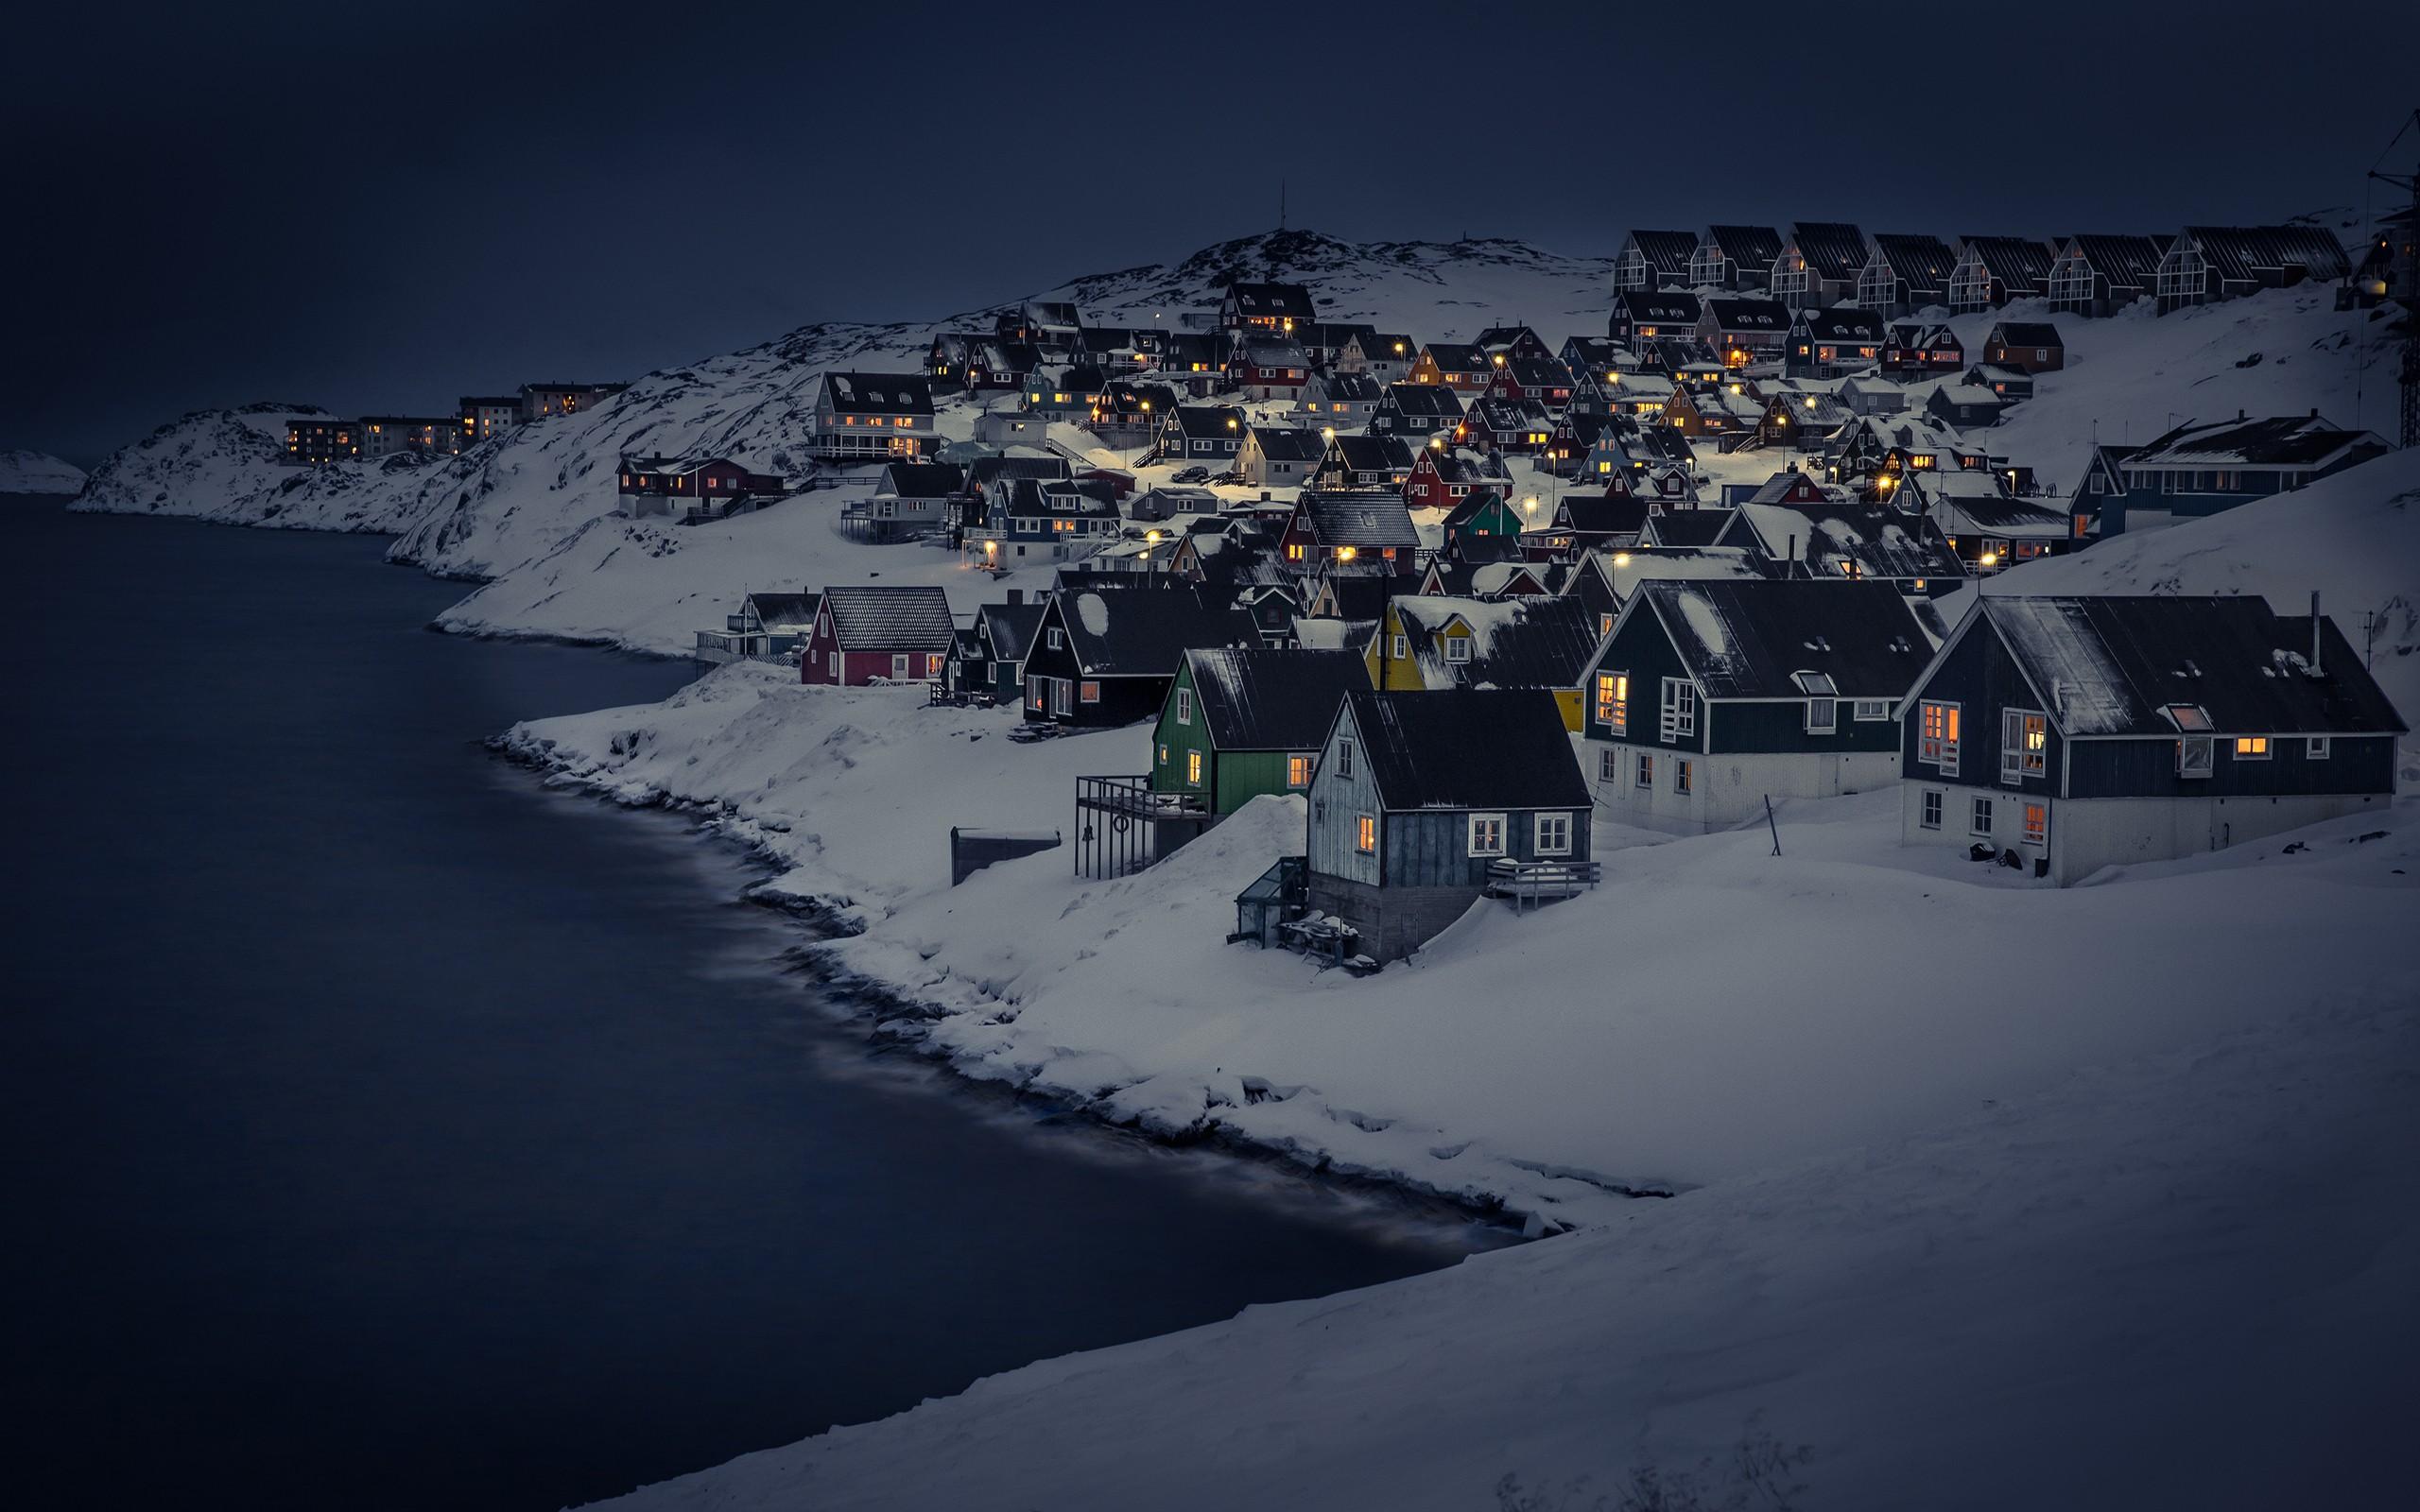 House Lake Light Night Snow Village Winter 2560x1600